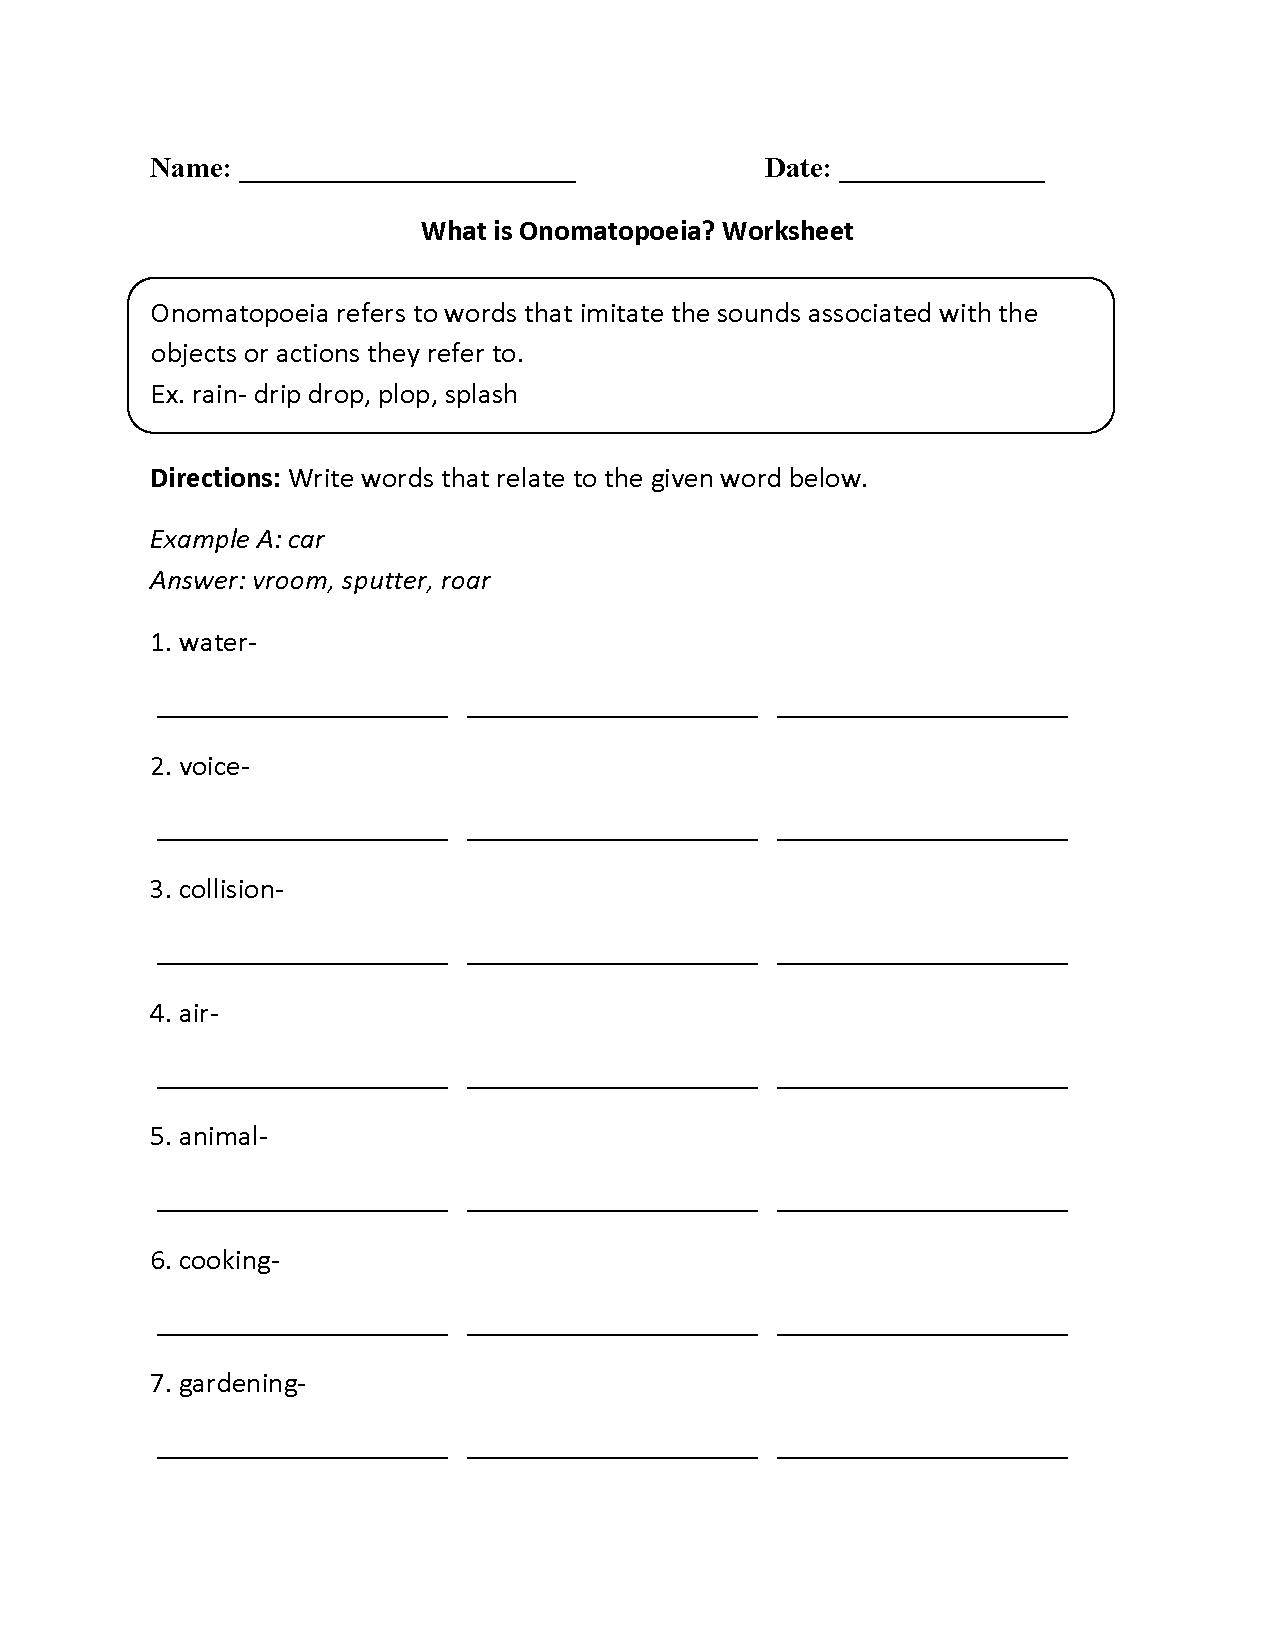 What Is Onomatopoeia Worksheet